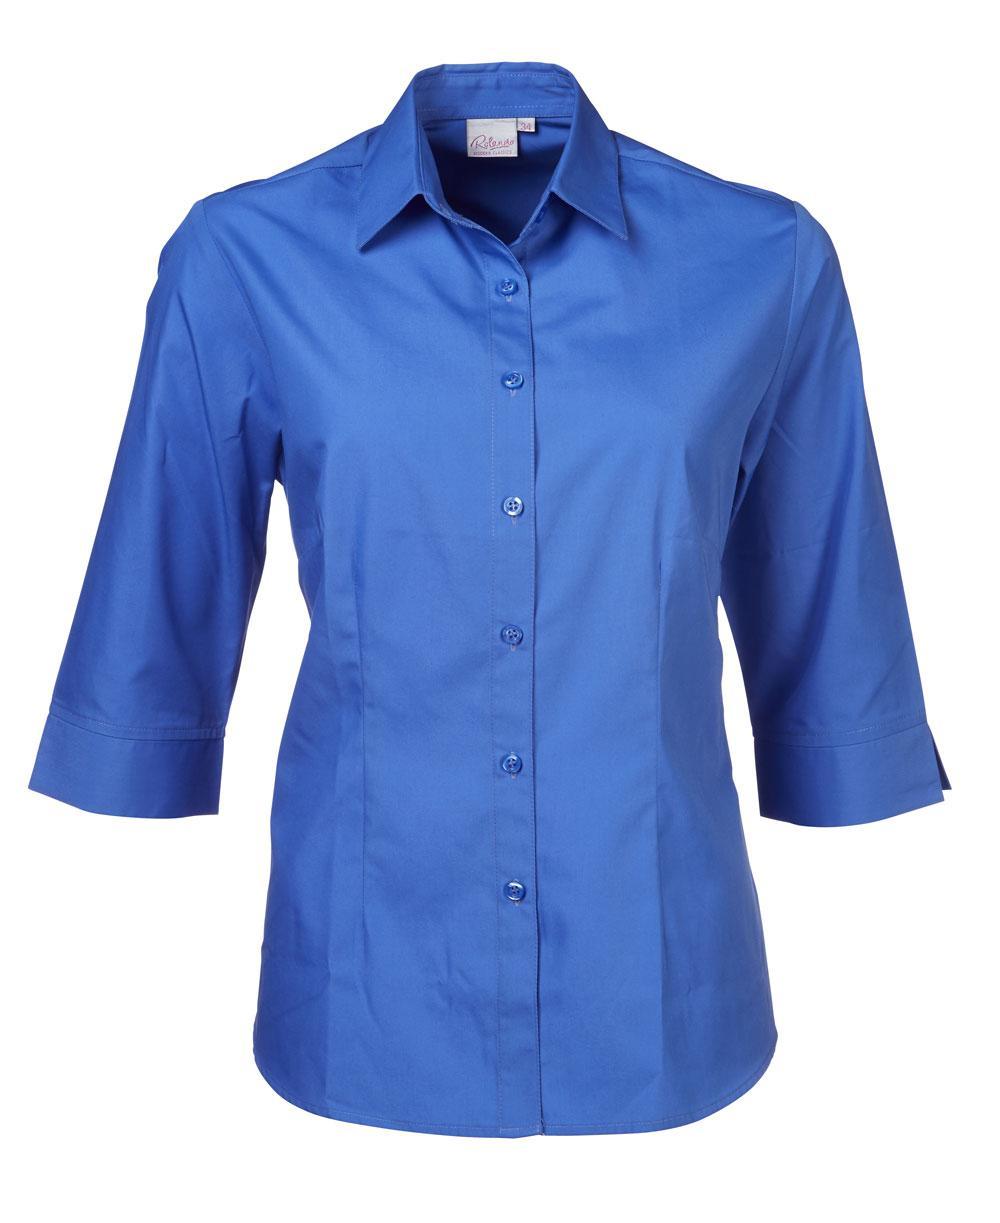 Cathy P070 3/4 Blouse - Blue